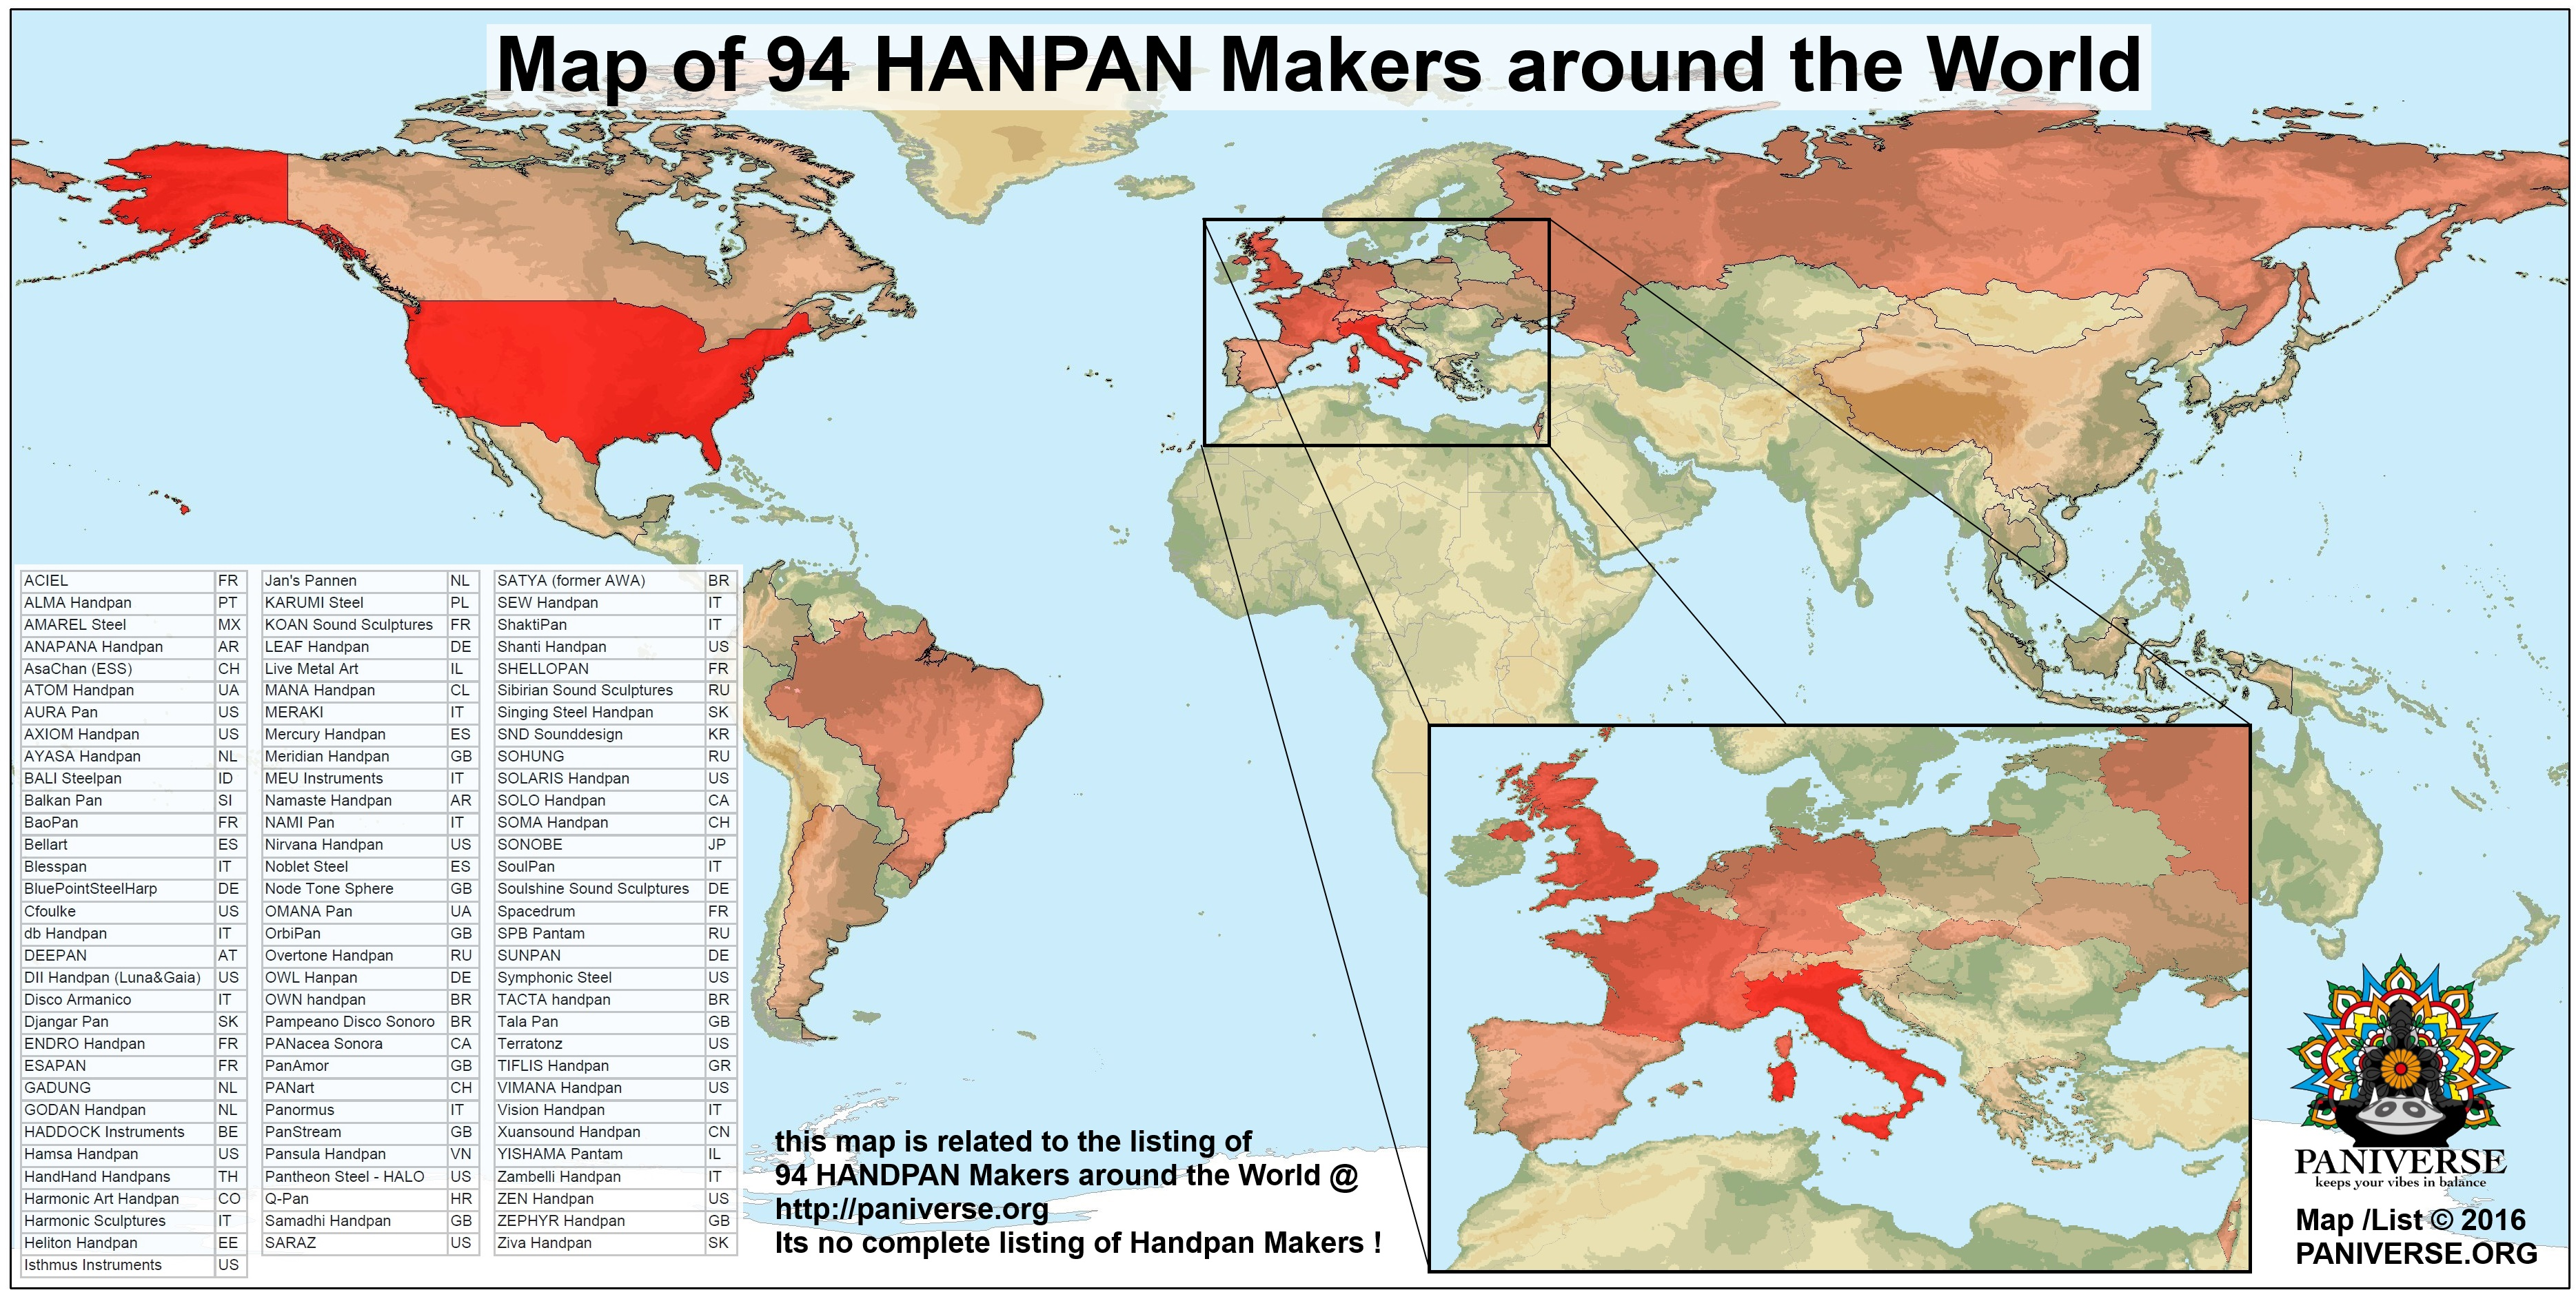 PANIVERSE List & Map of 94 Handpan Makers around the World ...